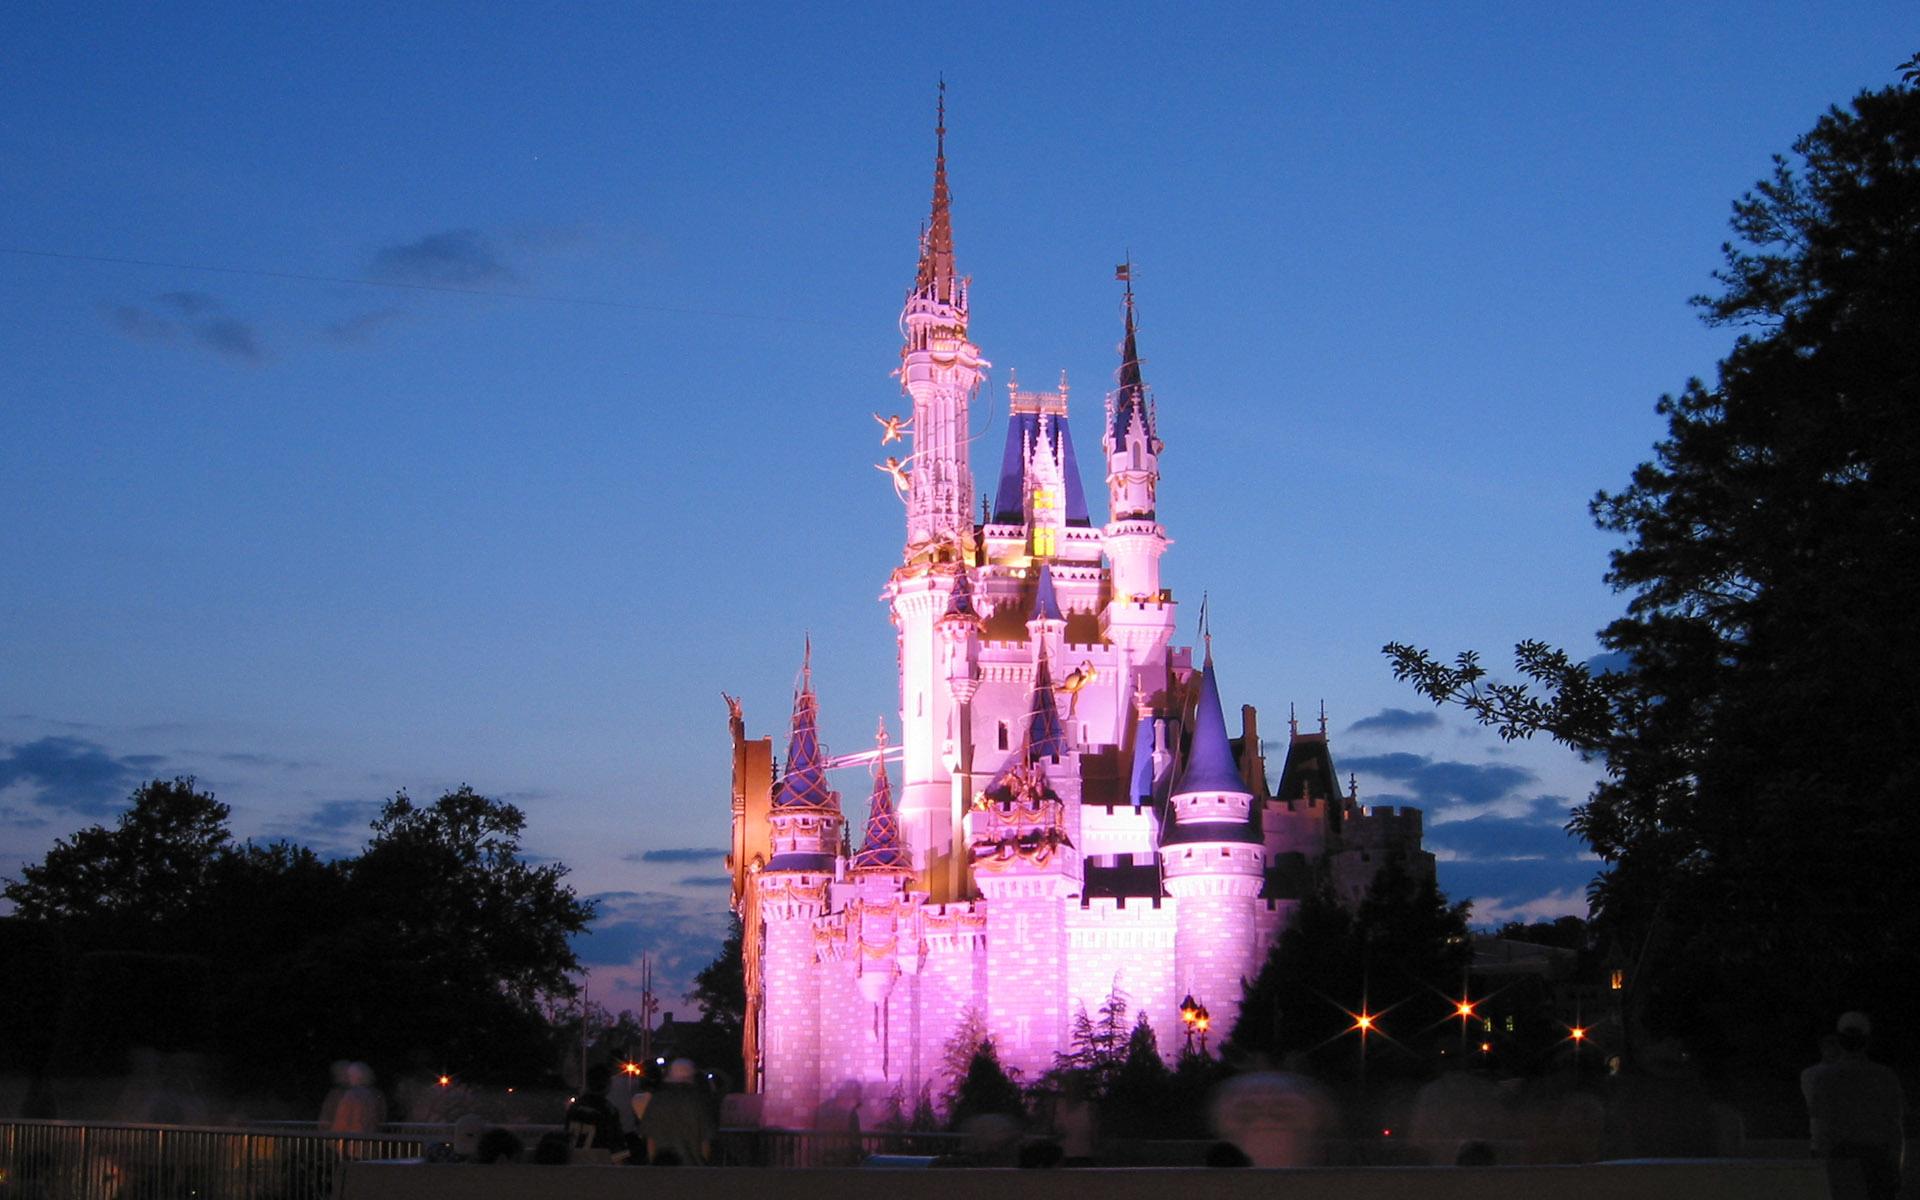 Frozen Quotes Wallpaper Disney Castle Wallpapers Hd Pixelstalk Net